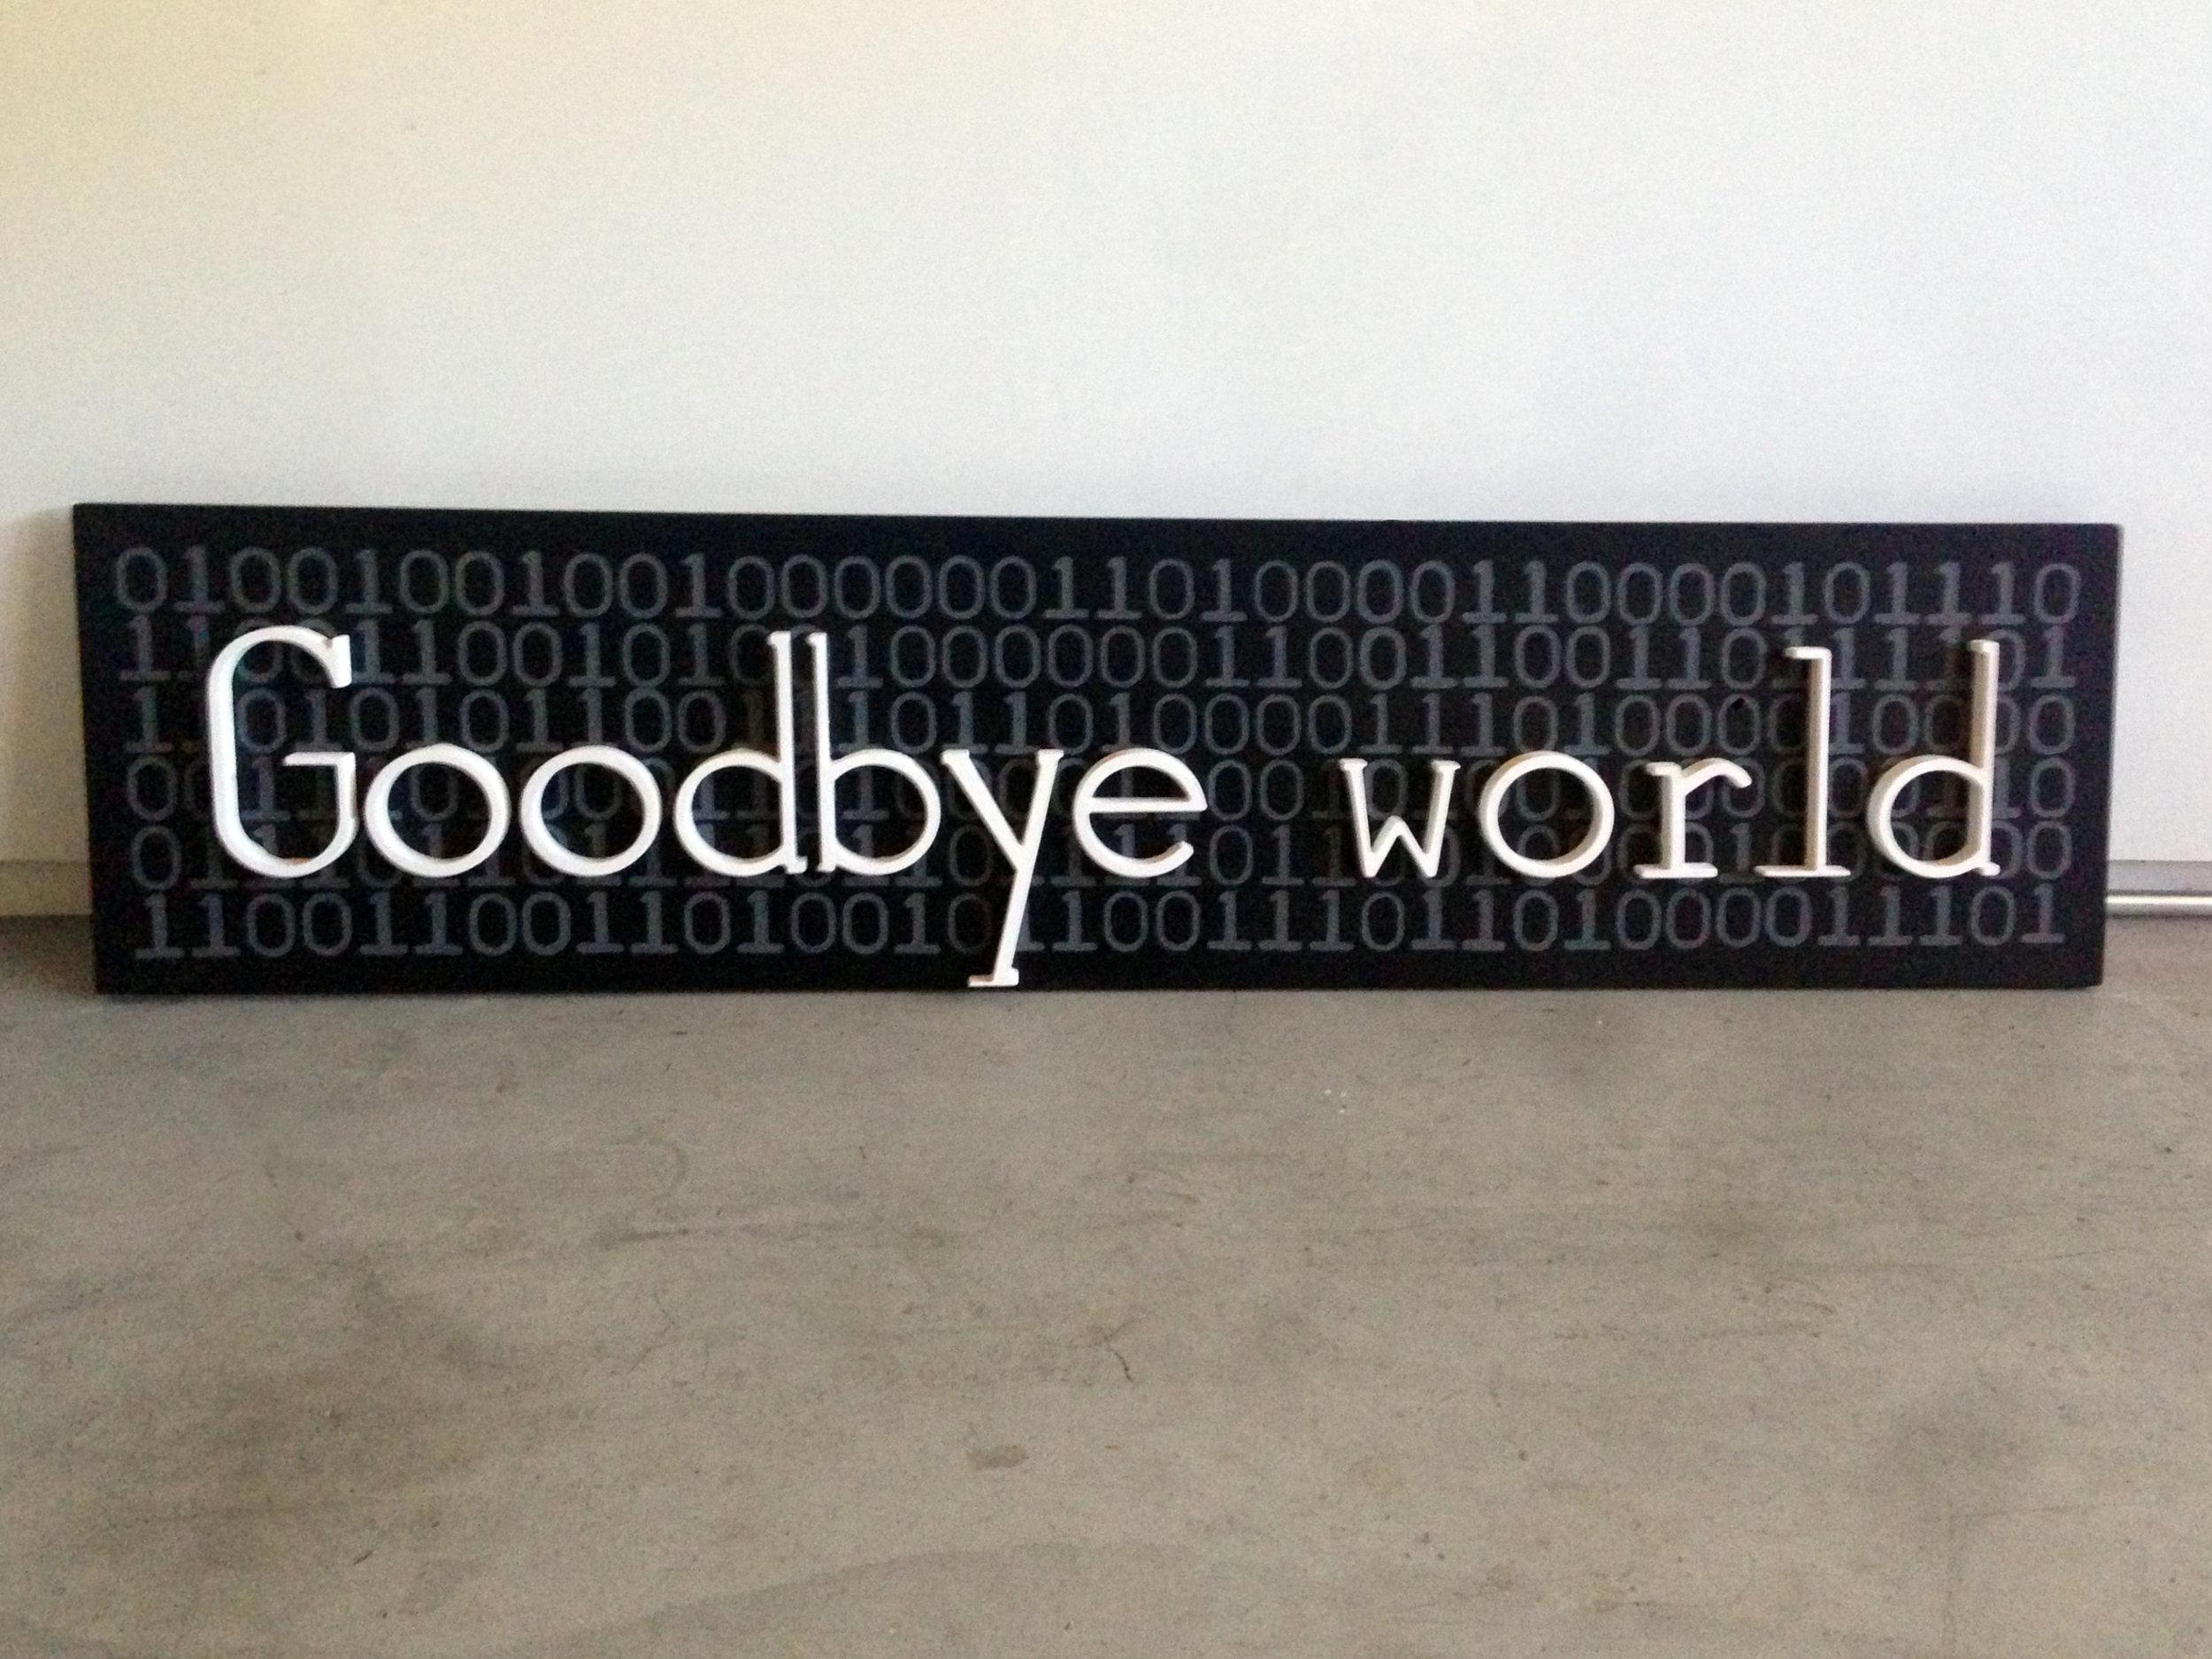 GoodbyeWorld.jpg